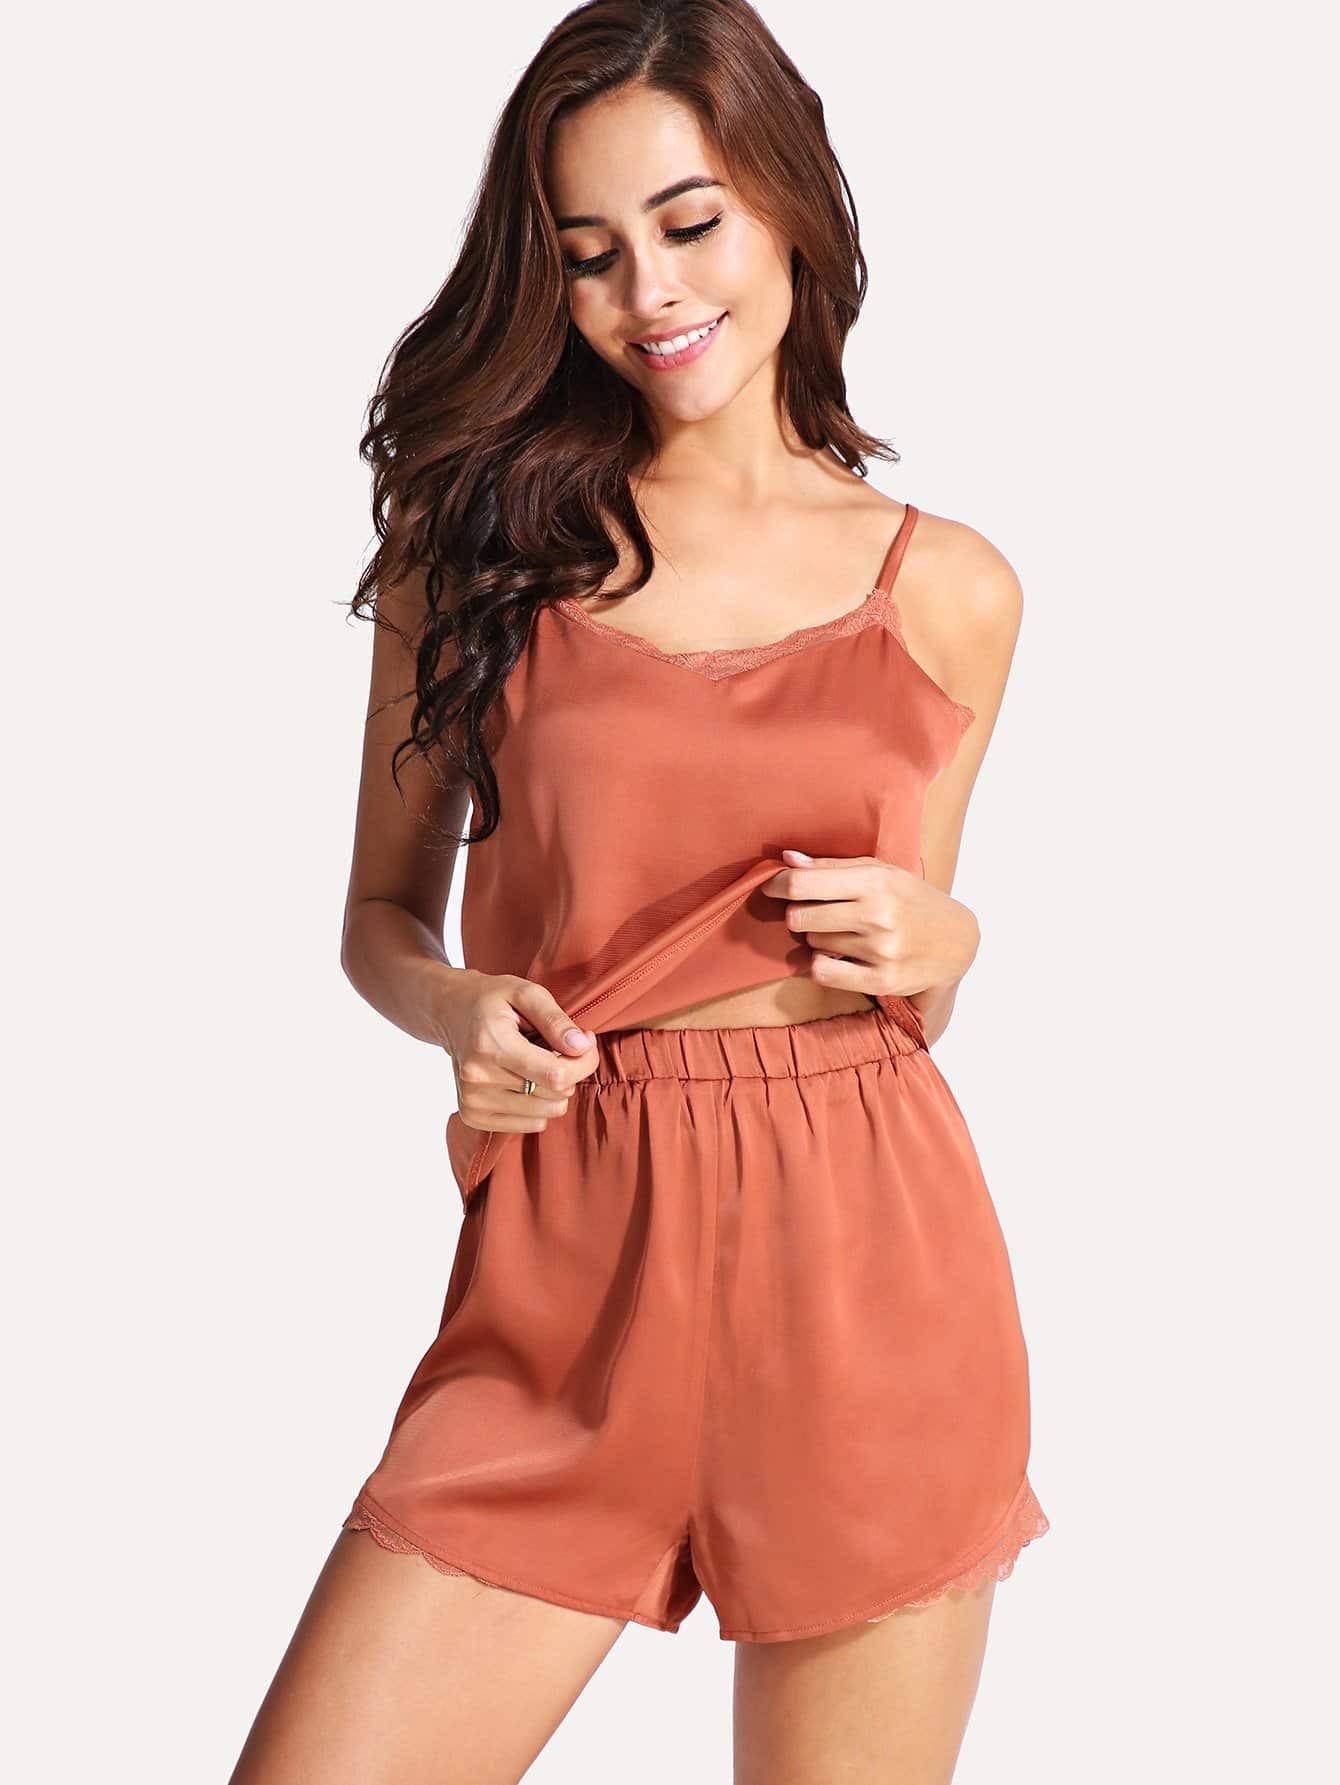 Contrast Lace Cami Pajama Set contrast lace cami with shorts pajama set